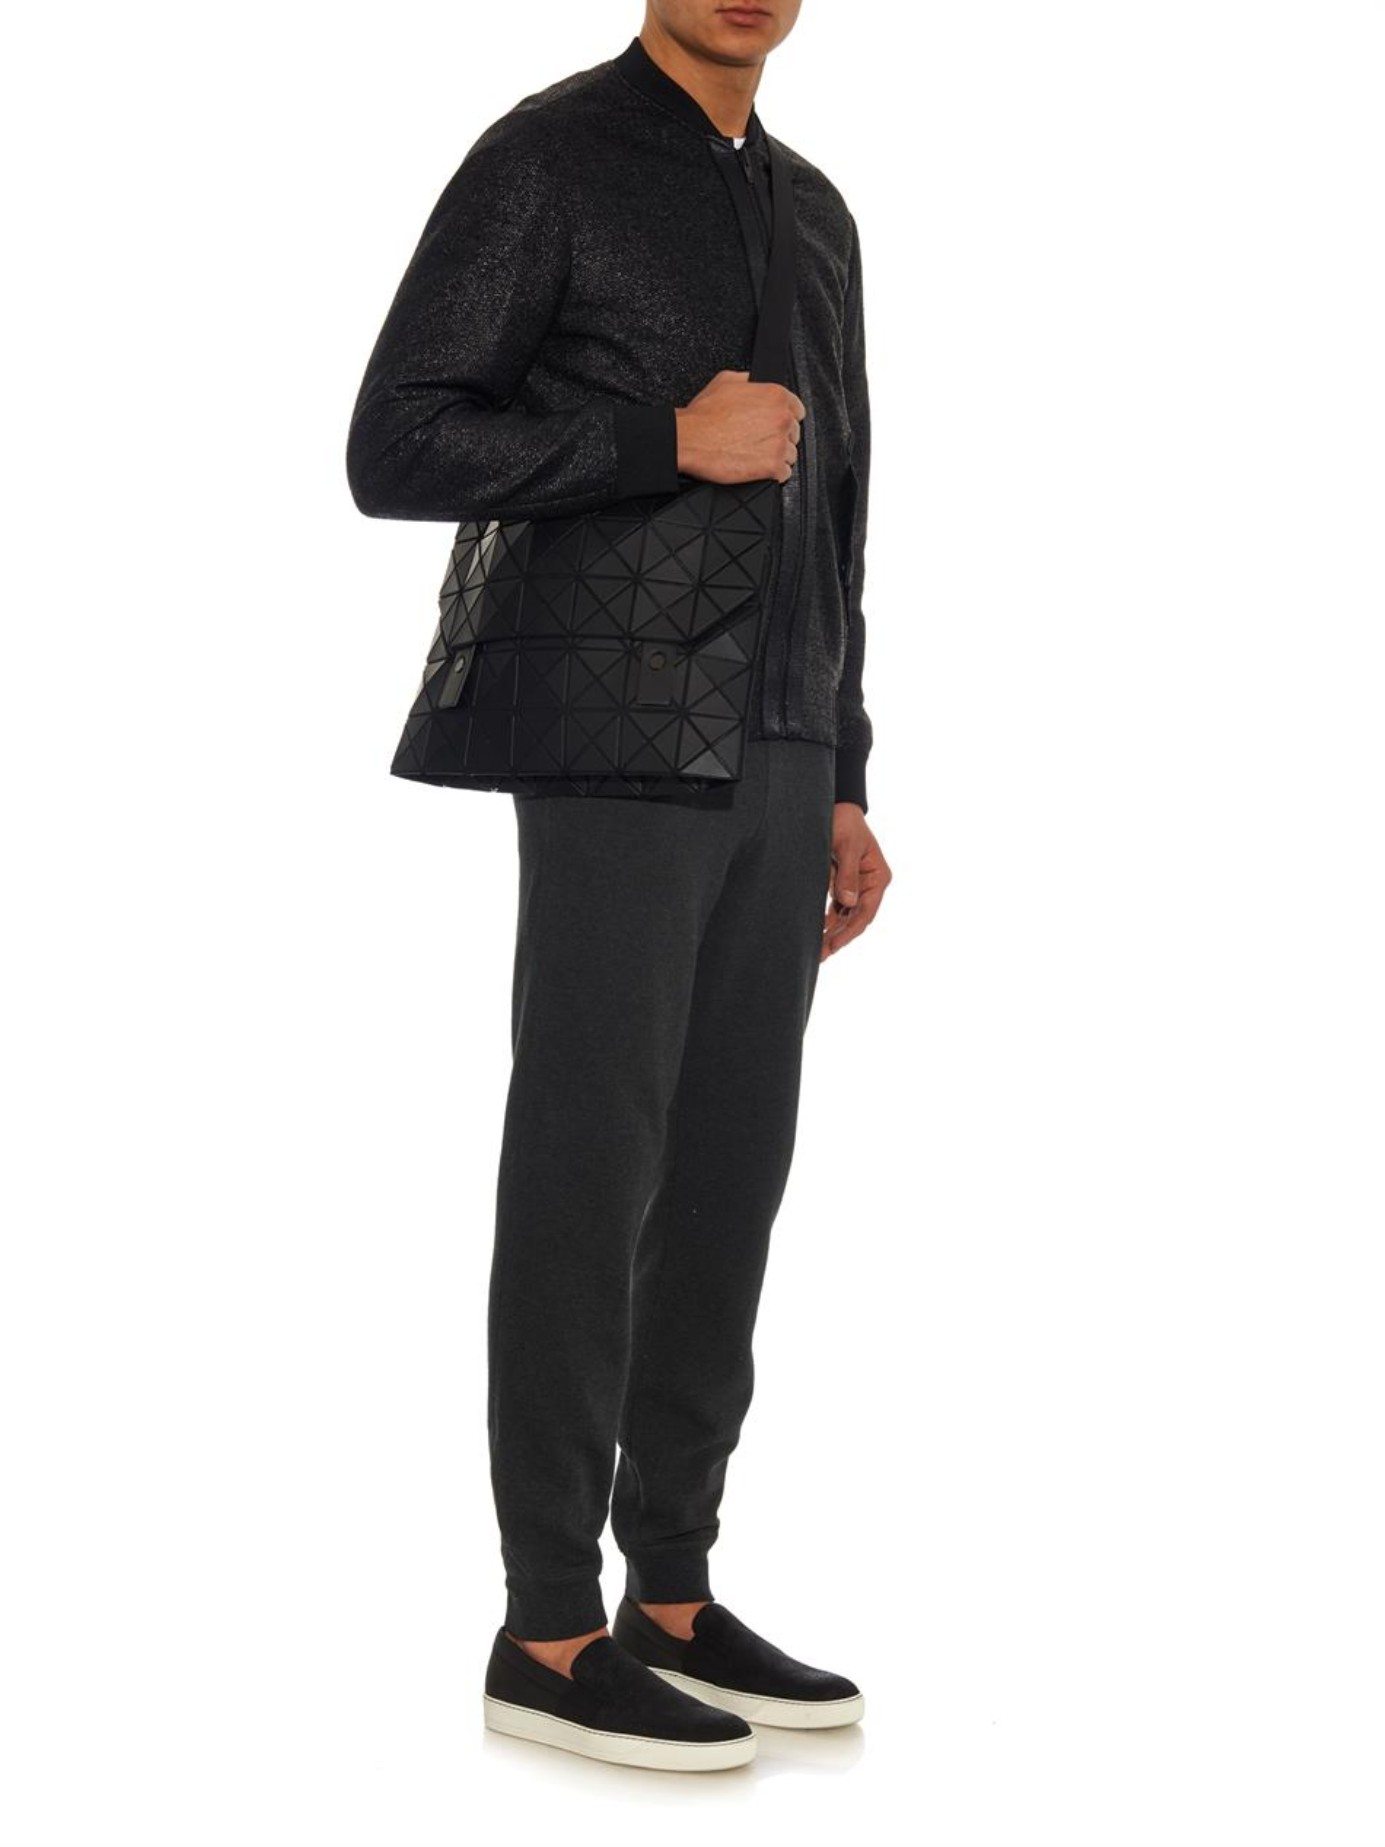 Bao Bao Issey Miyake Prism Messenger Bag In Black For Men